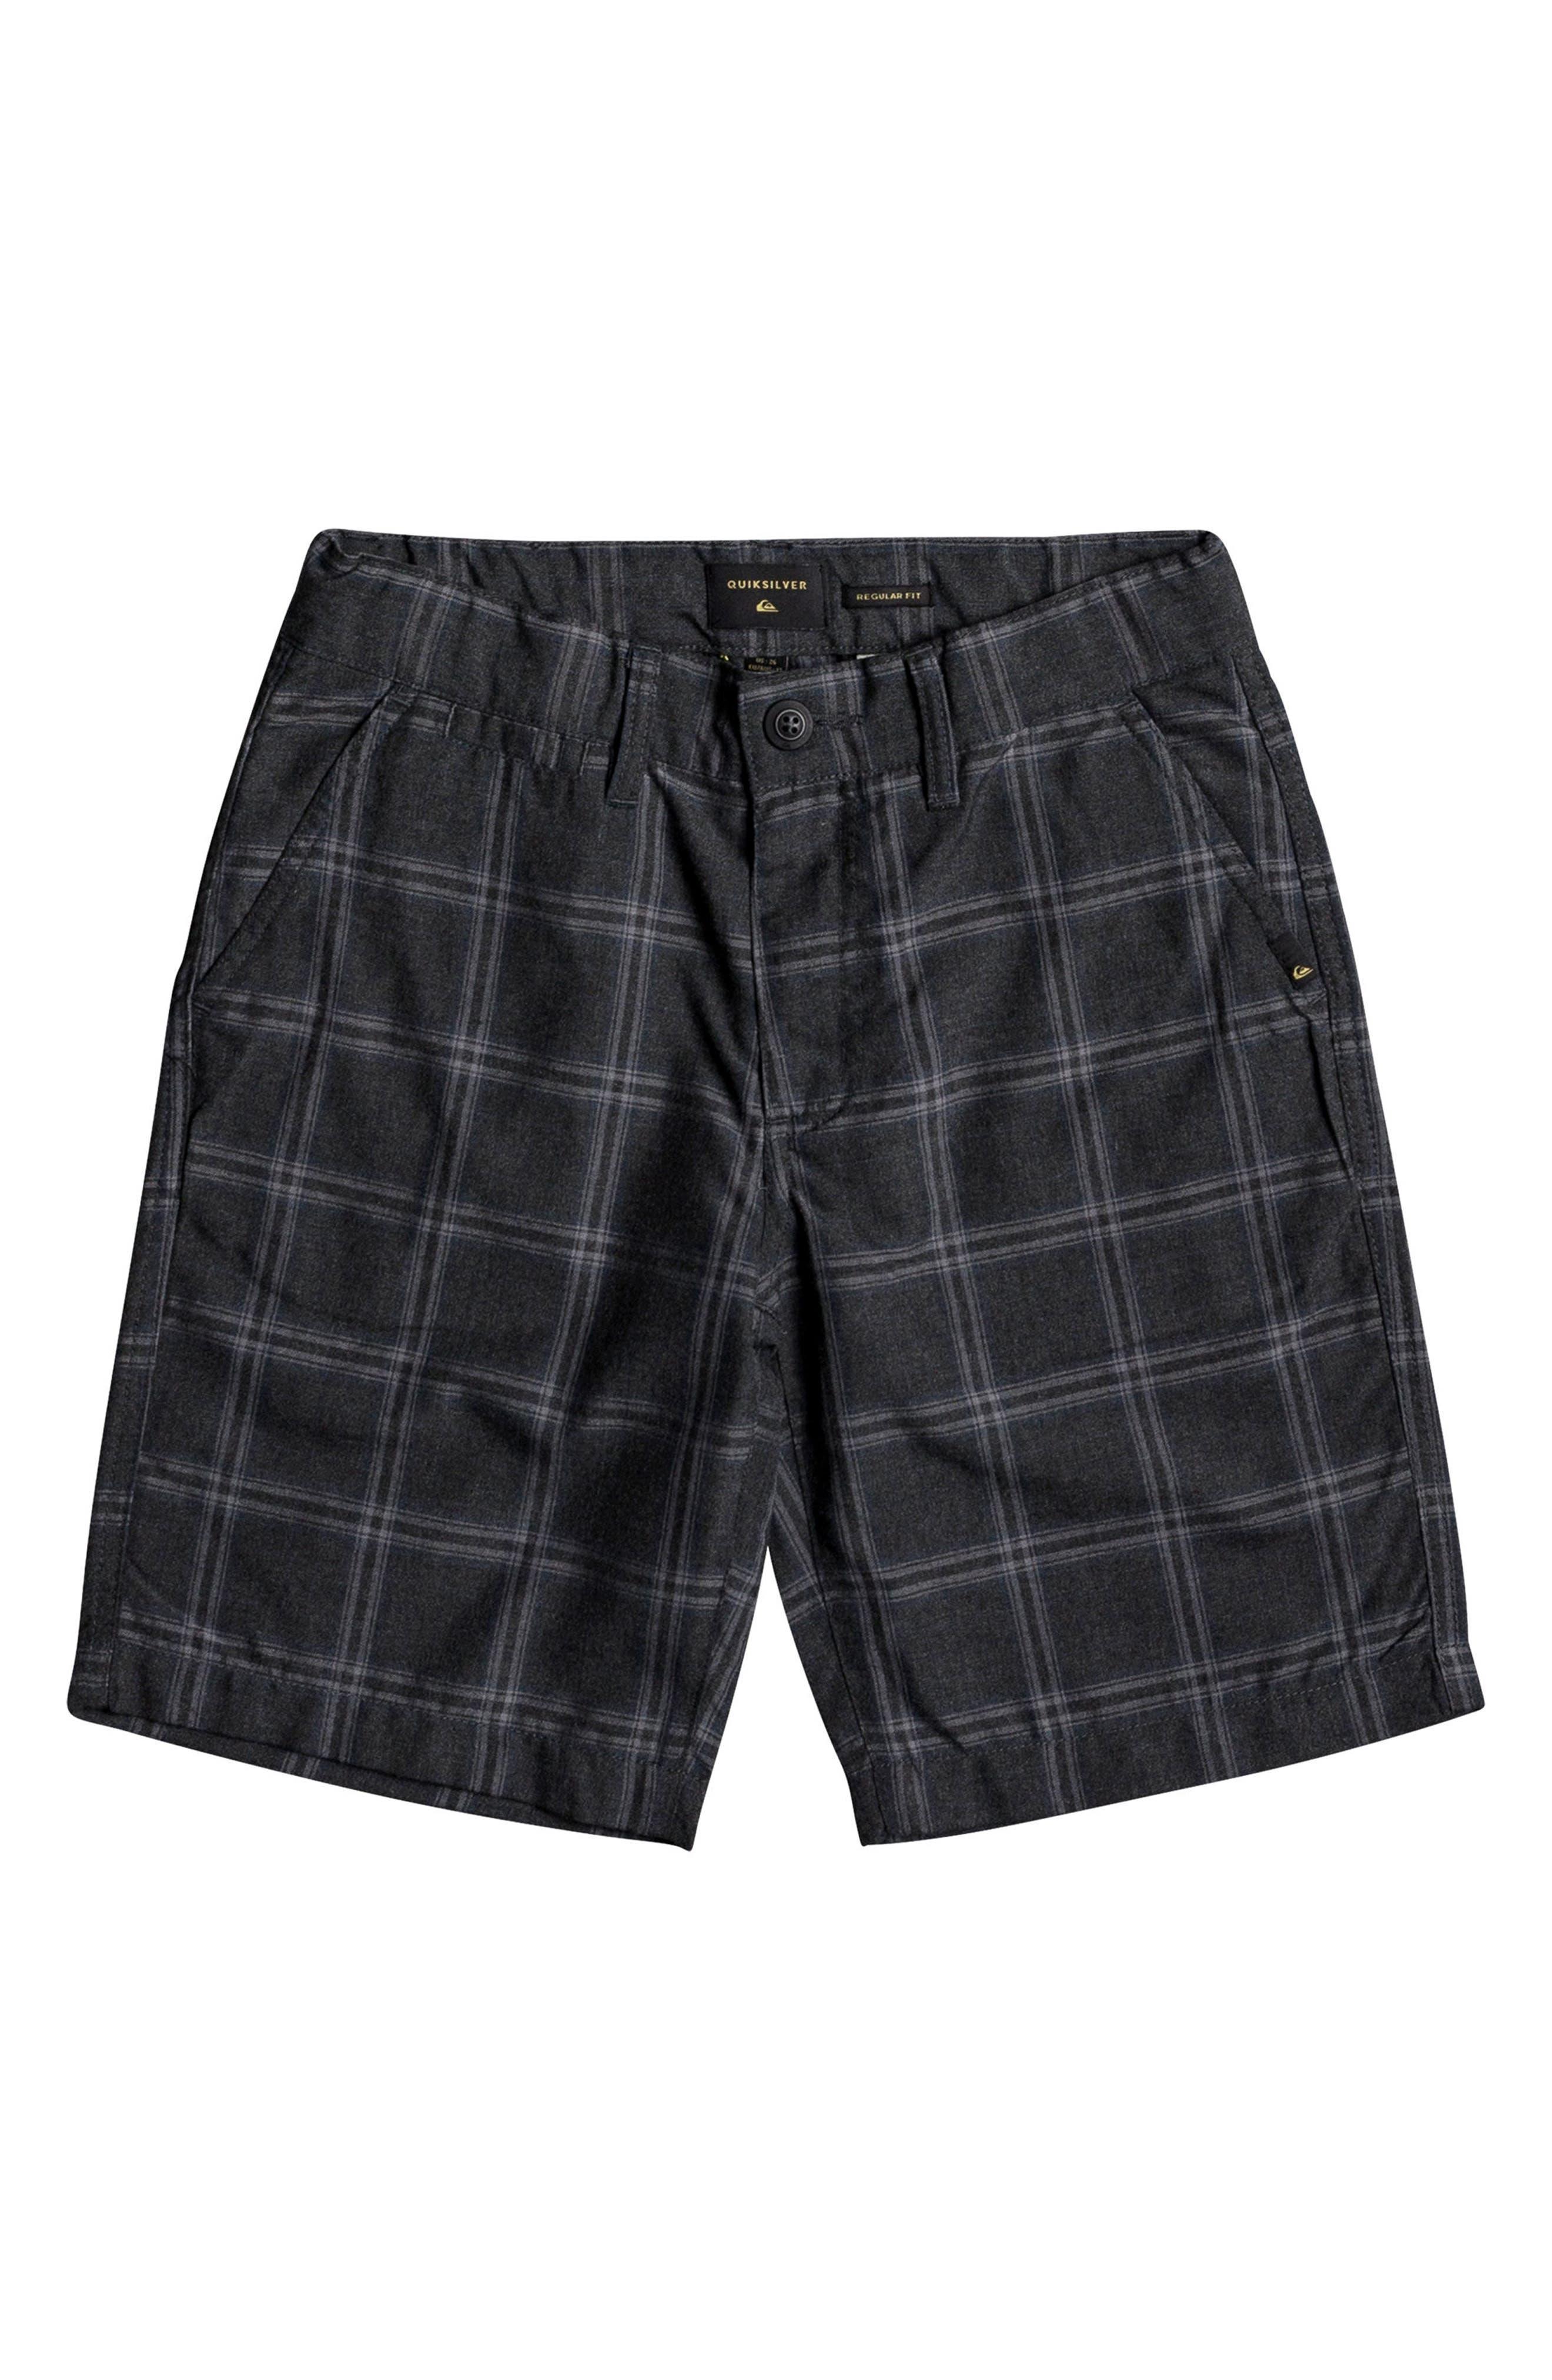 Main Image - Quiksilver Regeneration Shorts (Big Boys)